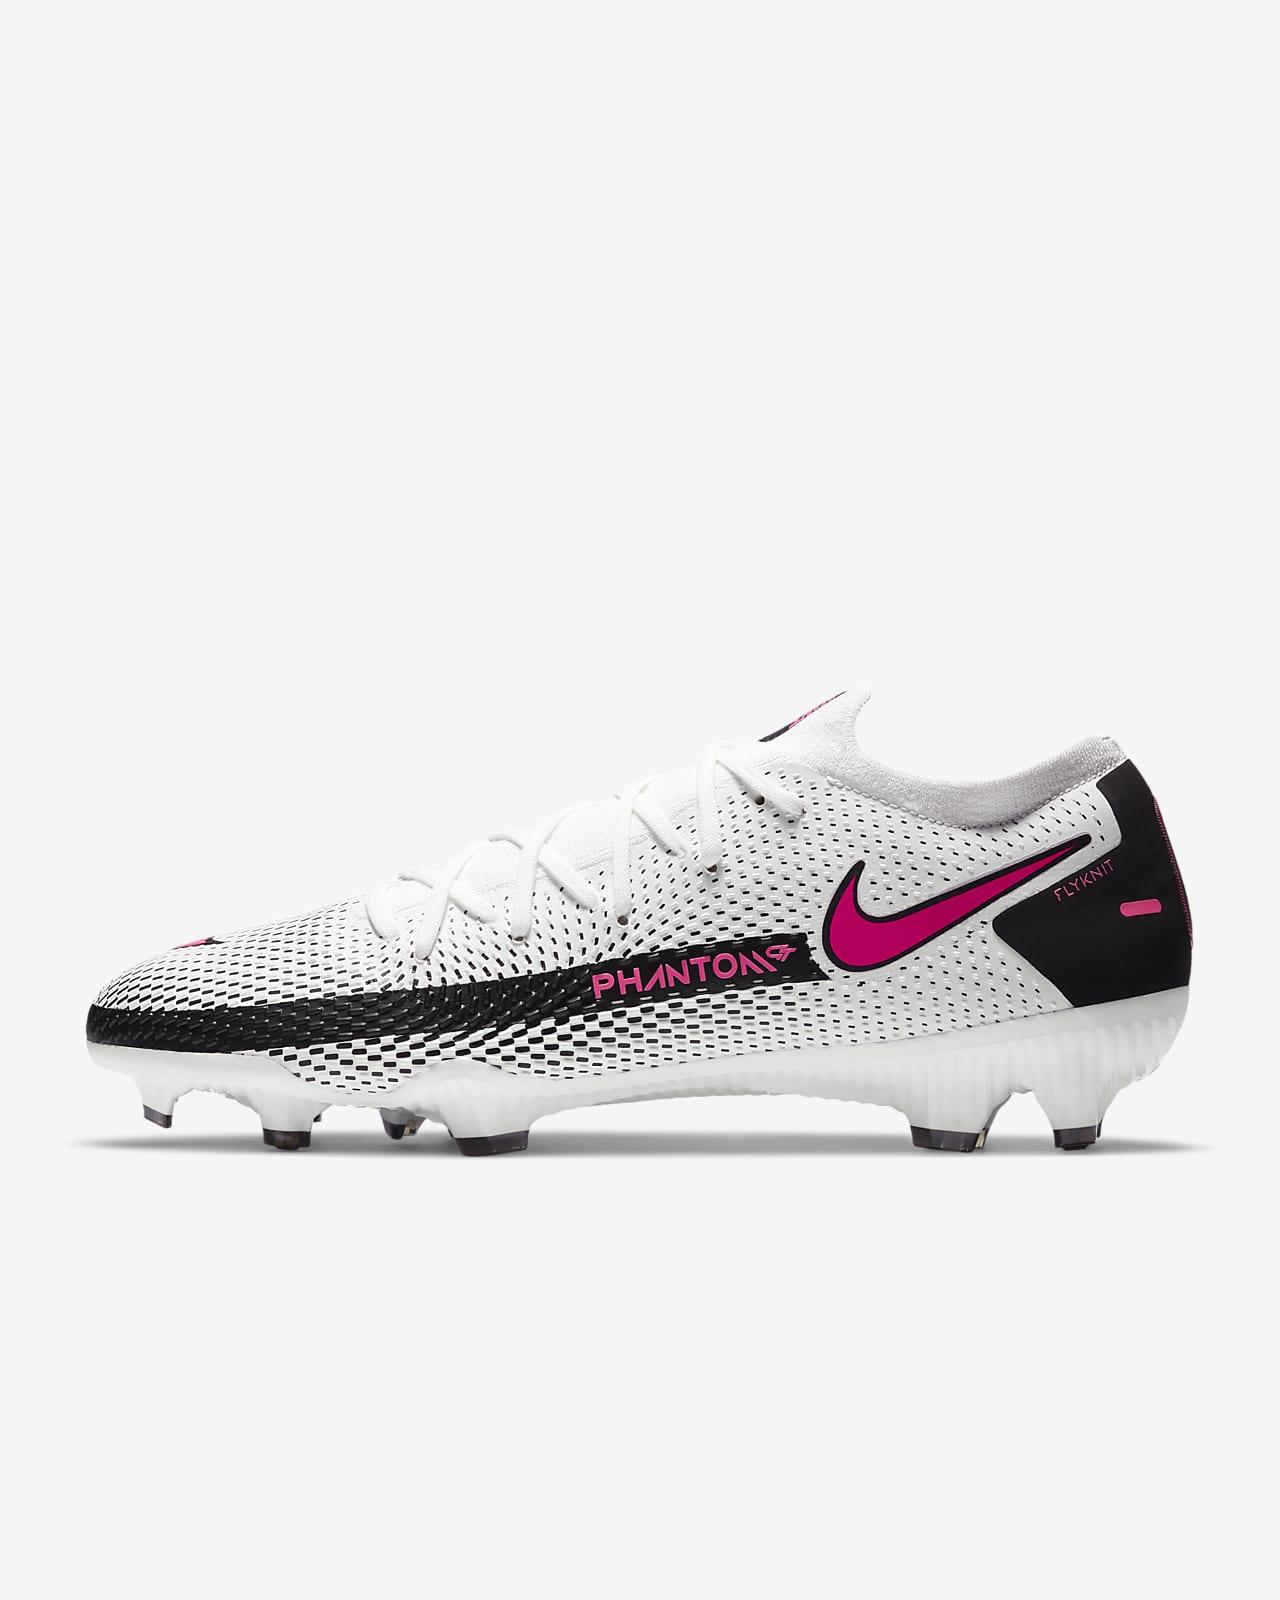 Nike Phantom GT Pro FG Firm-Ground Football Boot